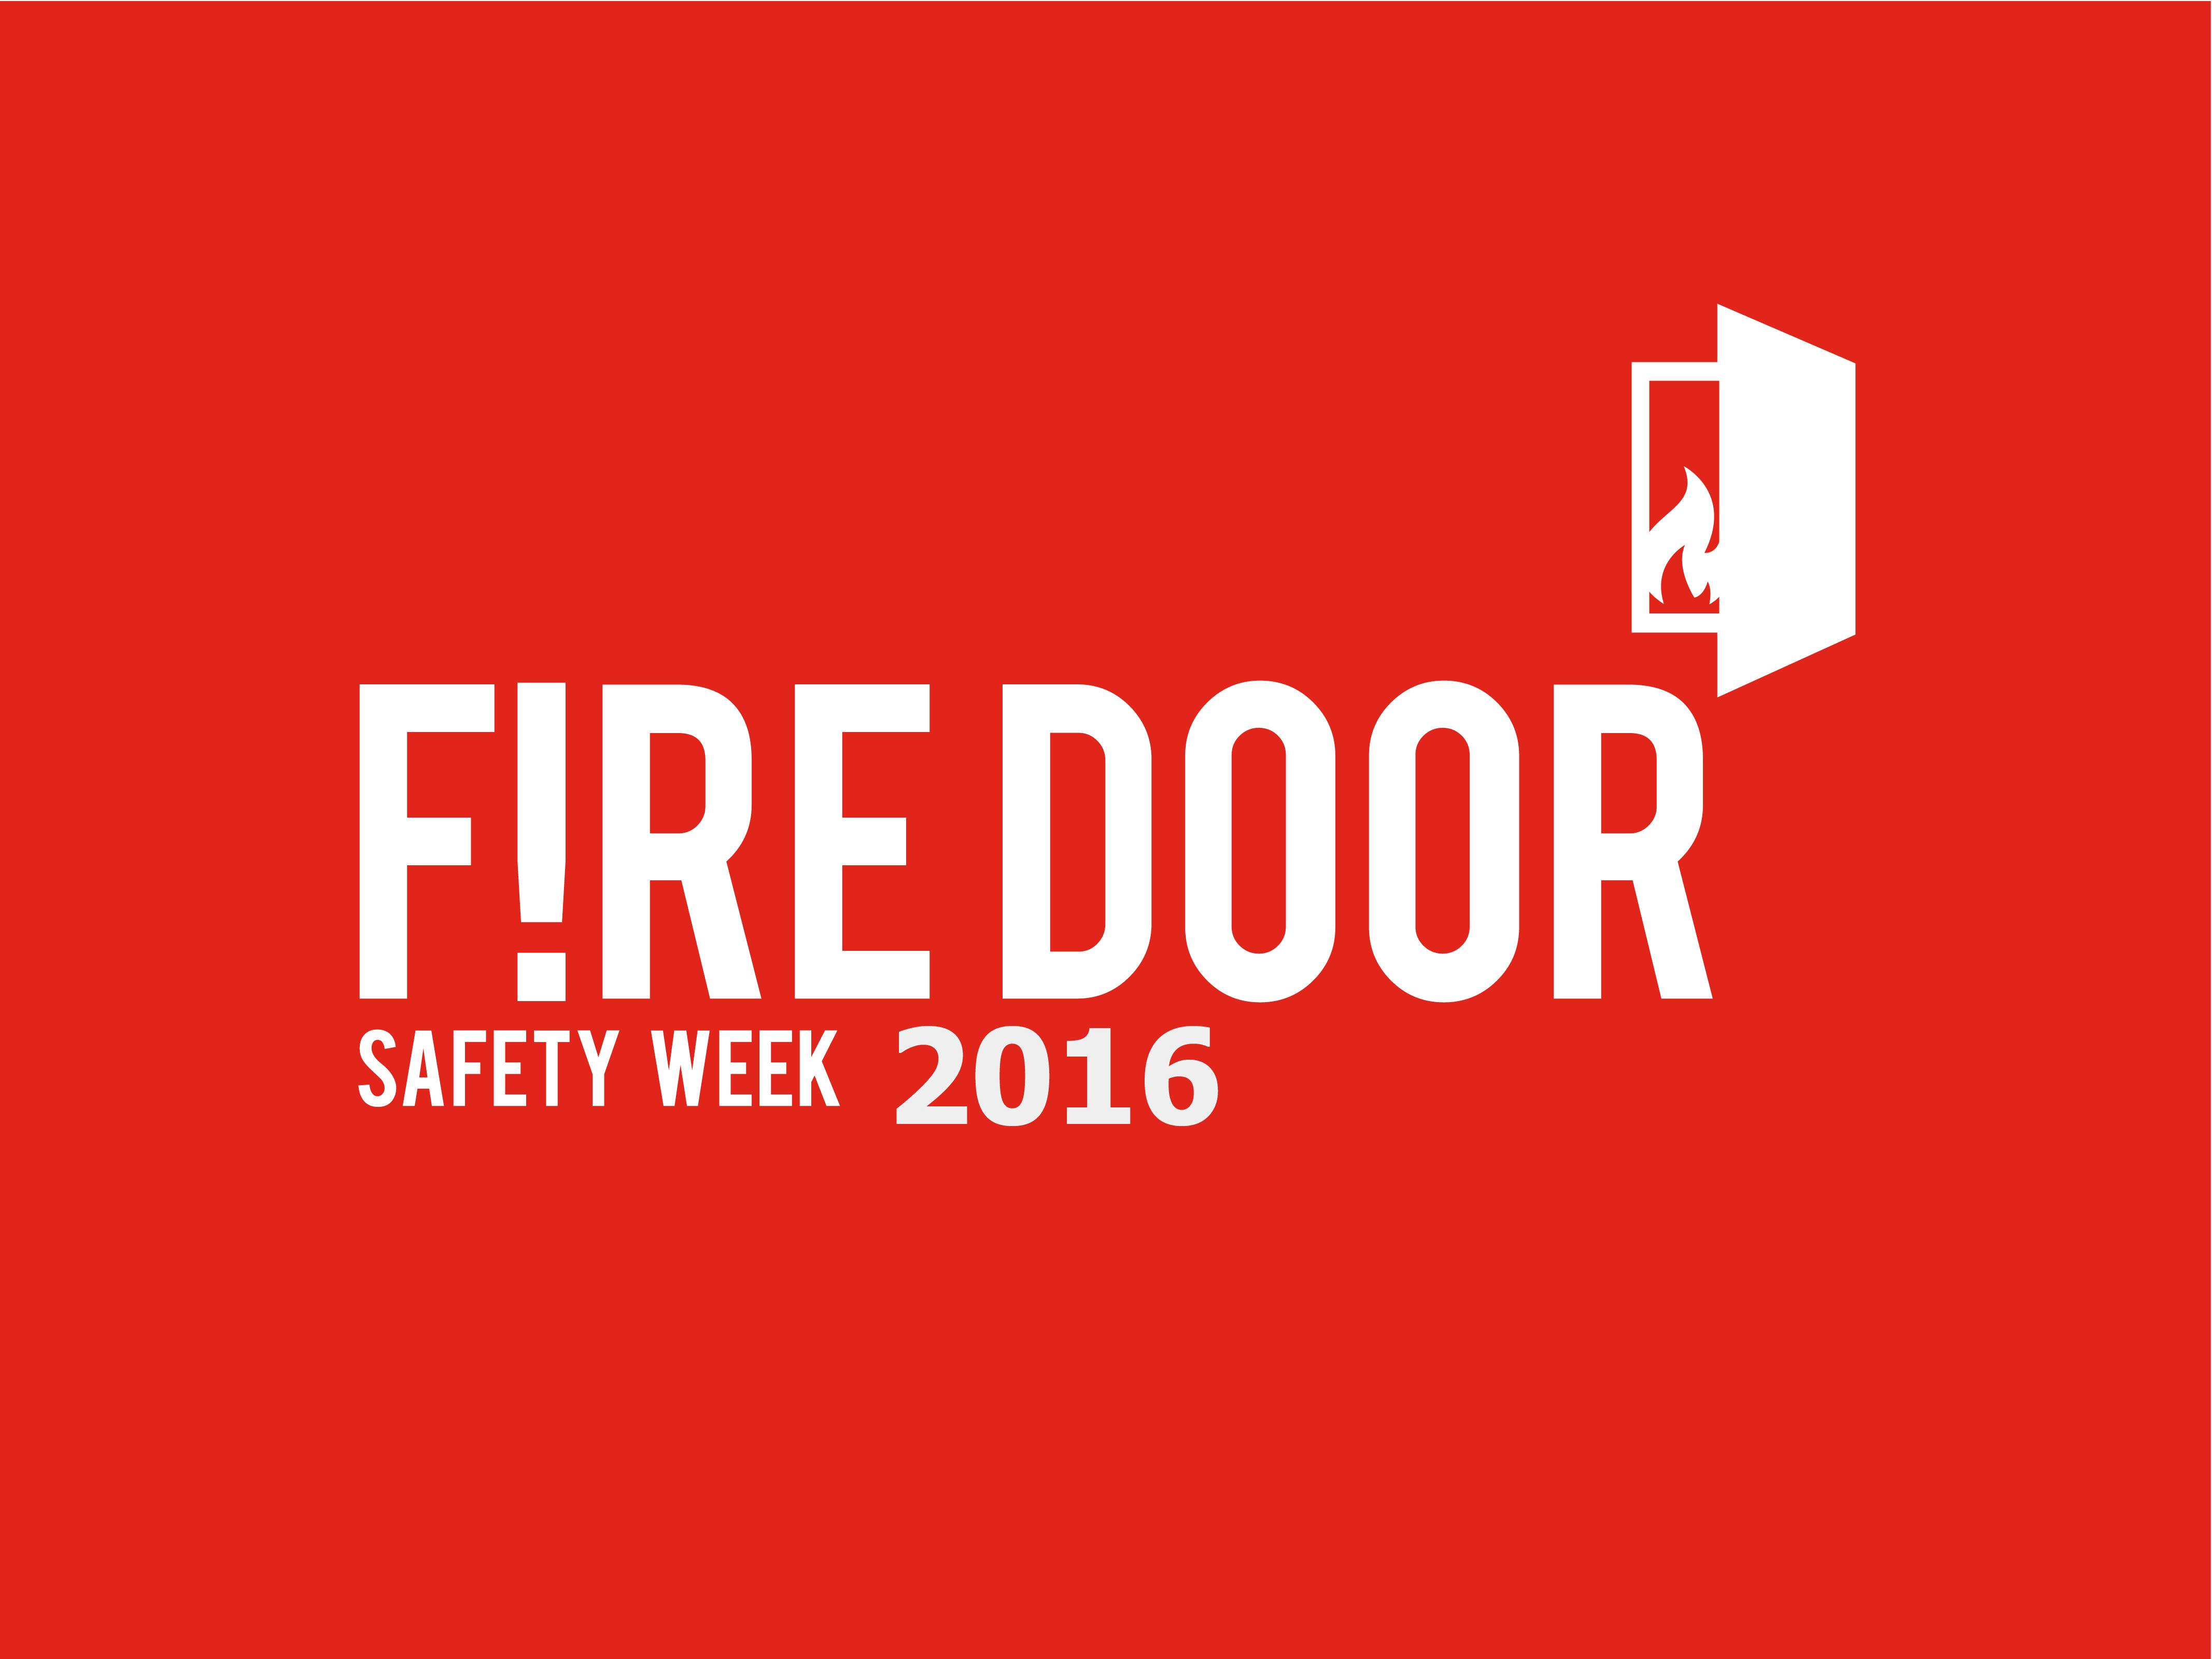 Fire Door Safety Week 2016 Logo